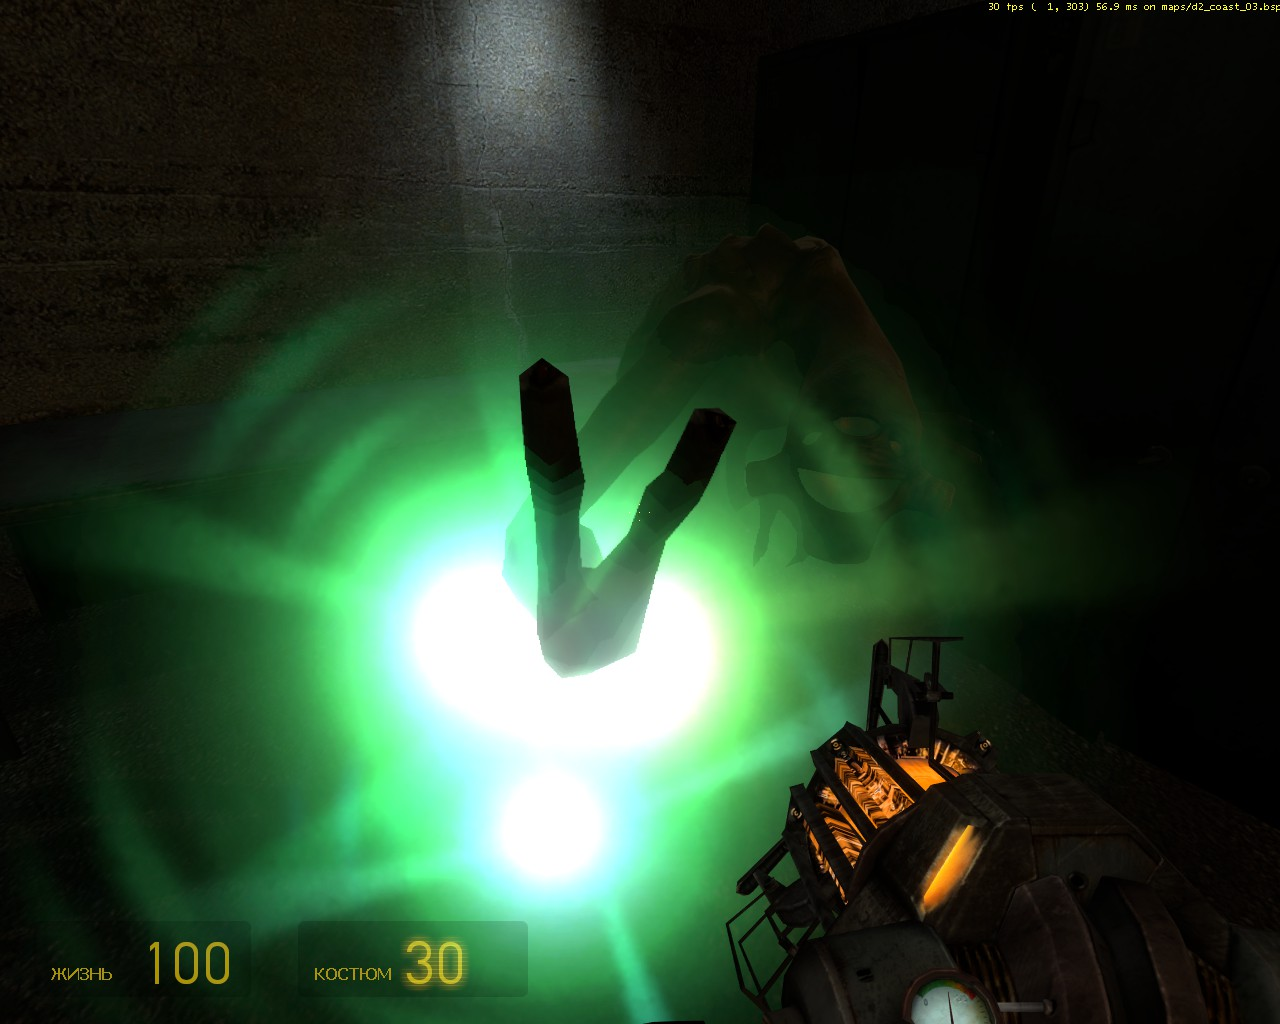 d2_coast_030011.jpg - Half-Life 2